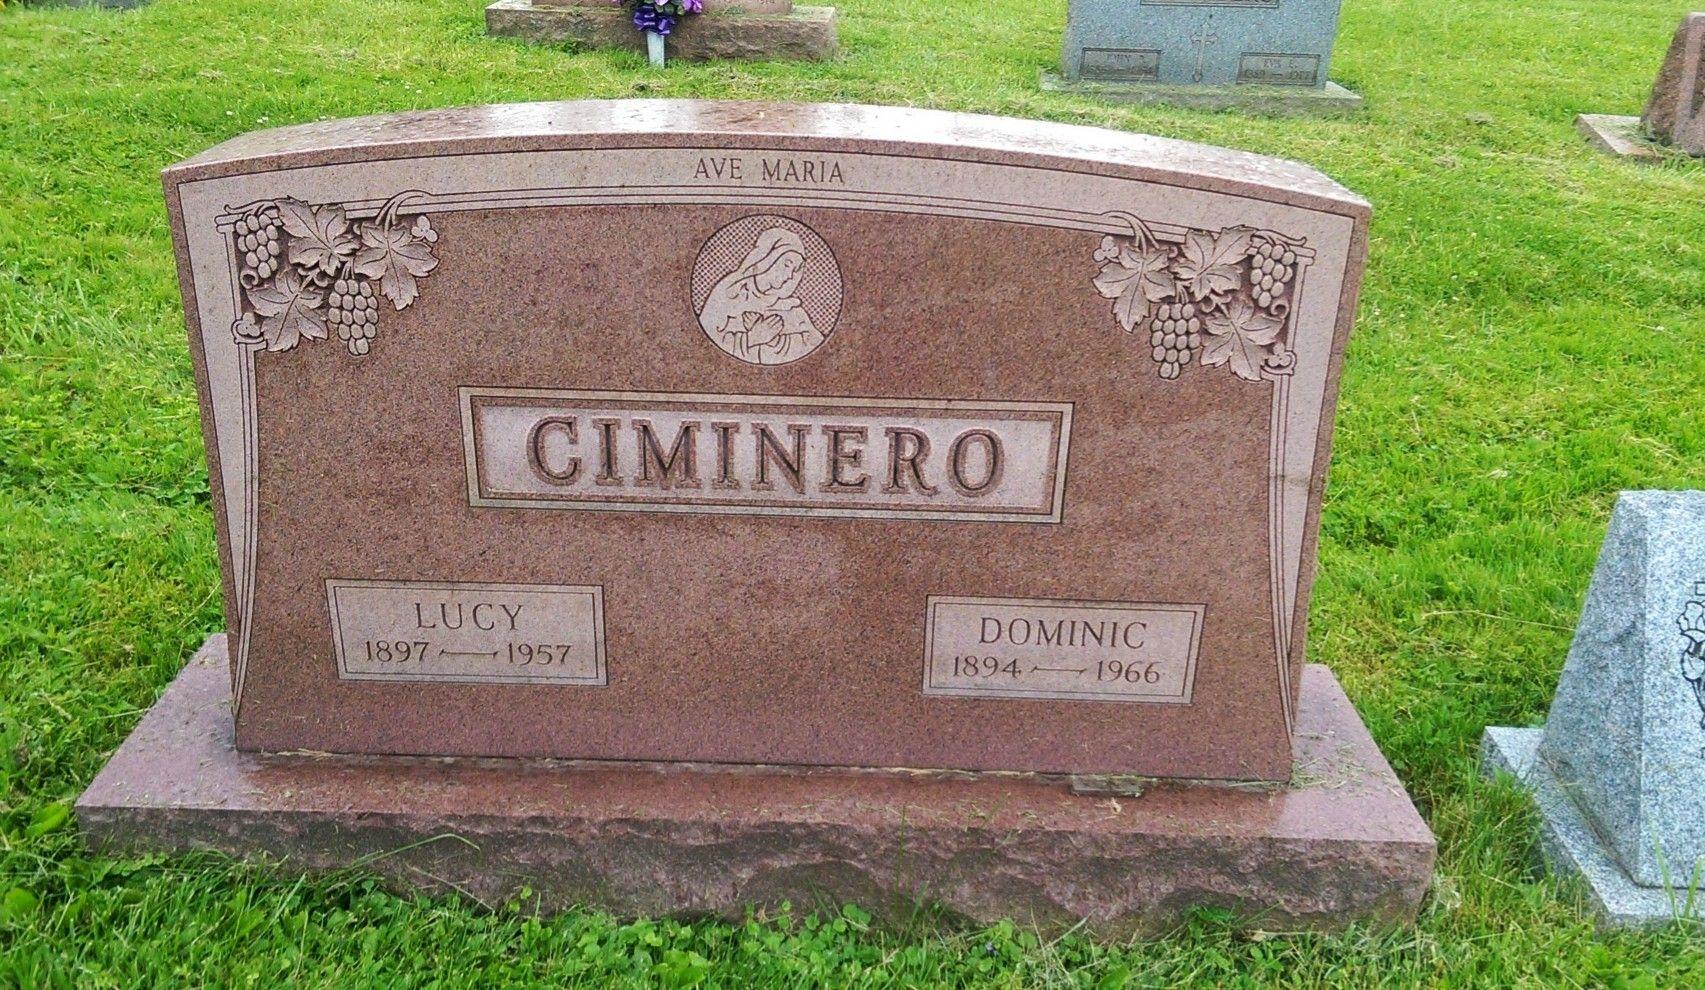 Dominic Ciminero